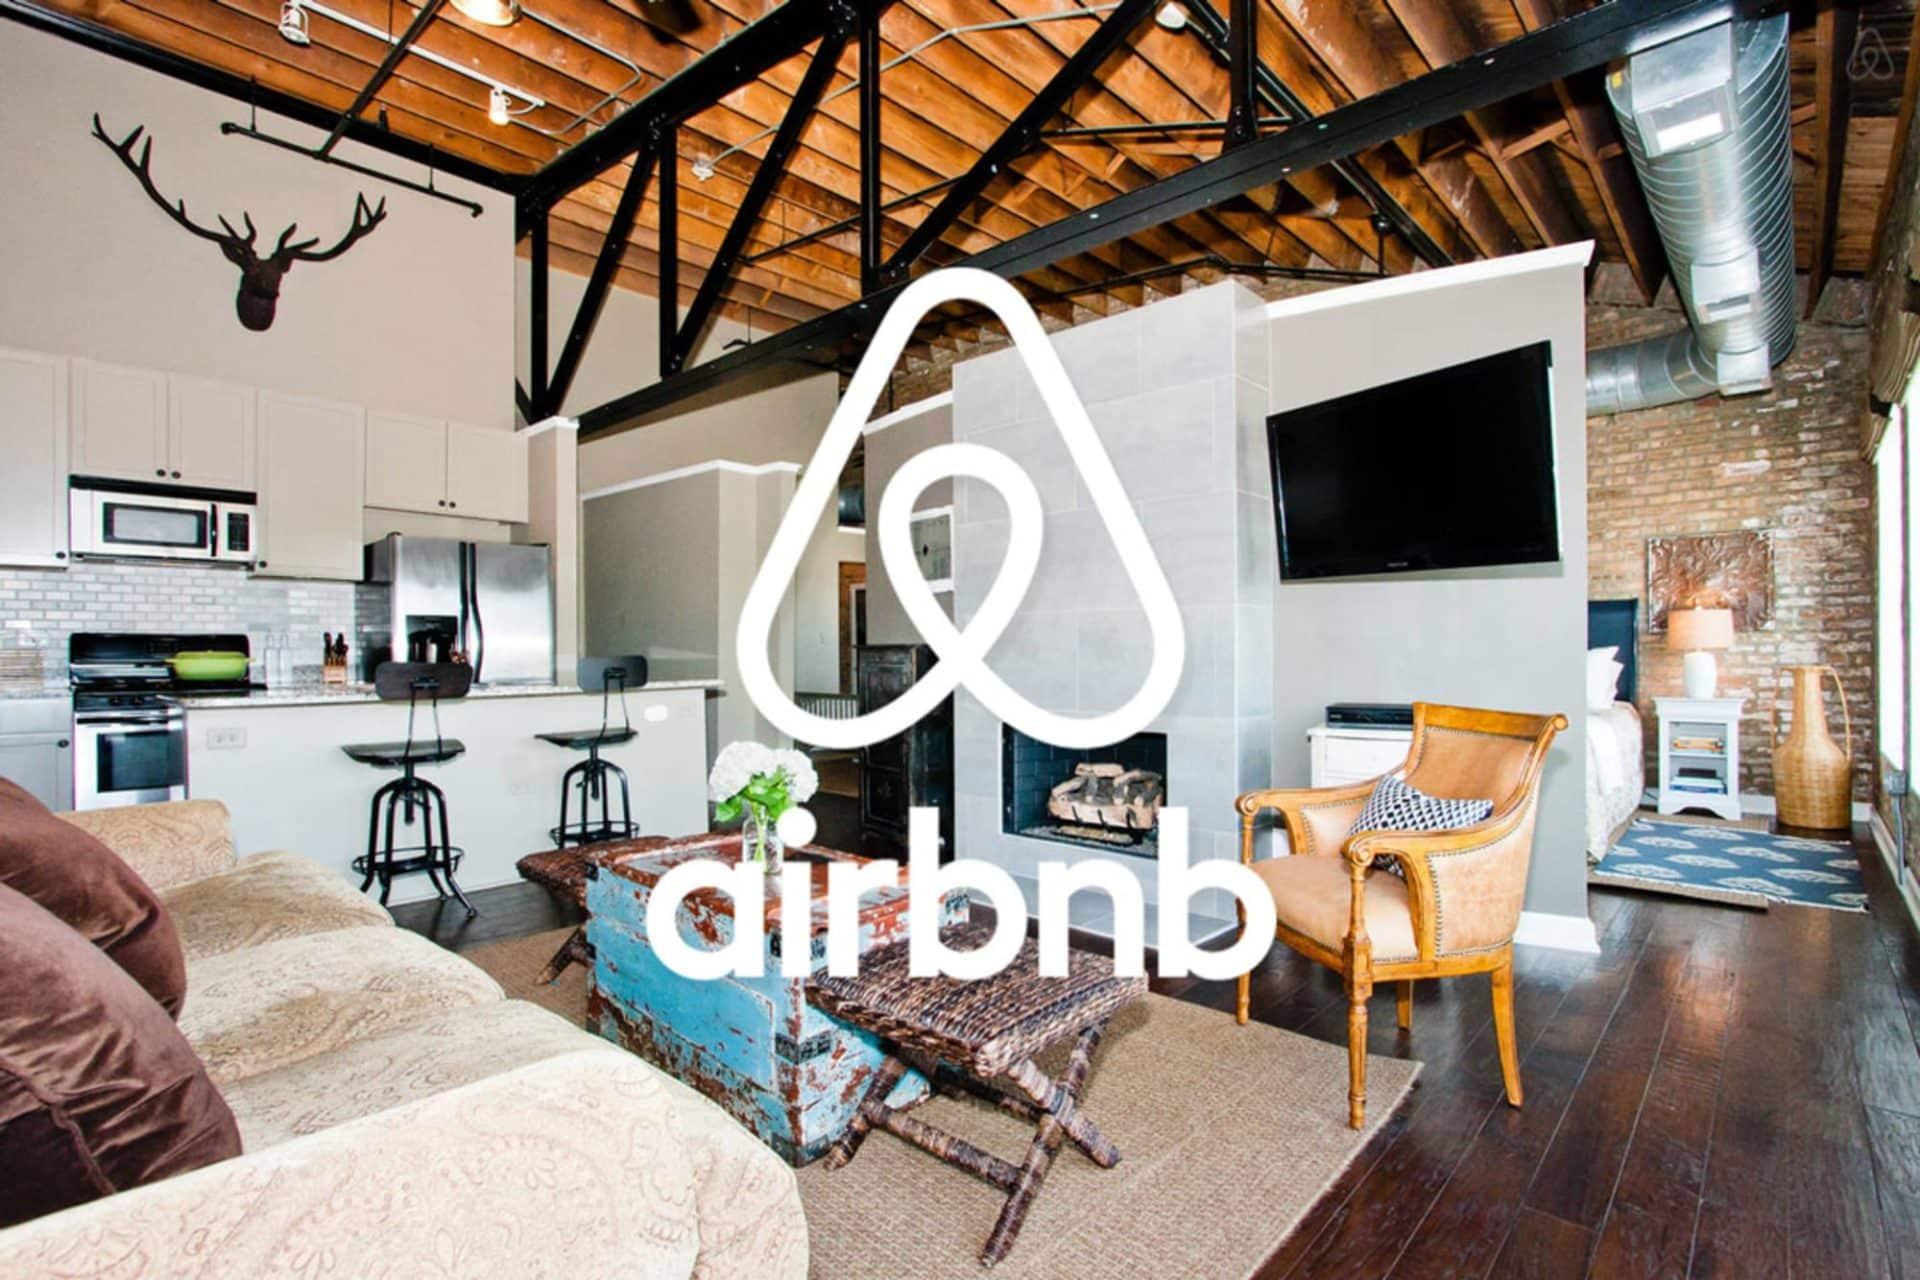 Airbnb, Hosting, Travel, Lodging, Alojamiento, Viajes